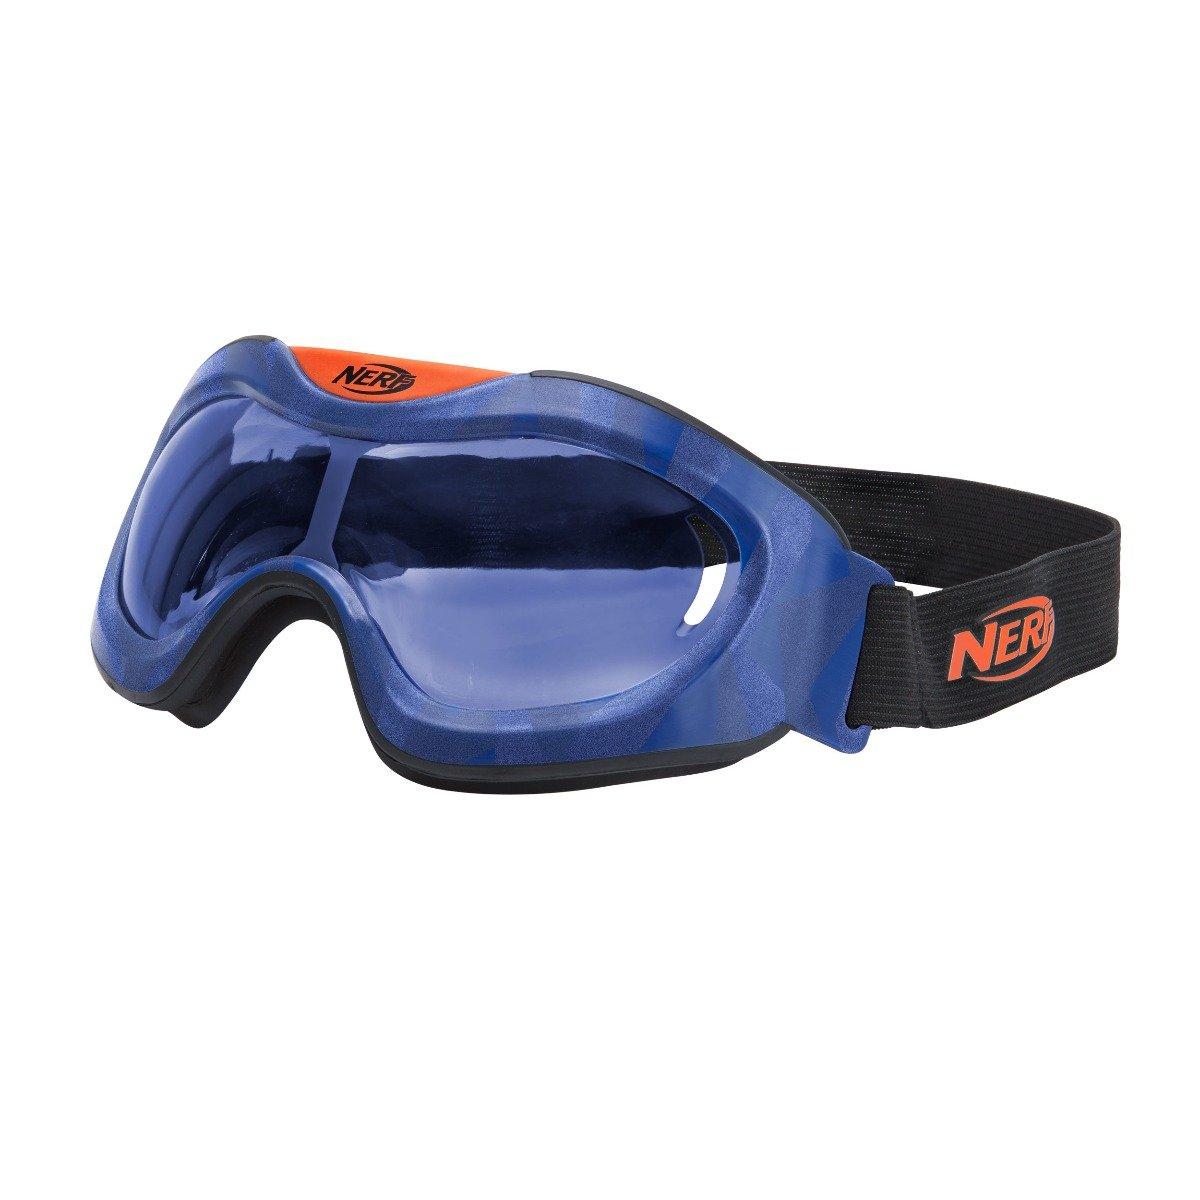 Ochelari de protectie Nerf Elite, Albastru